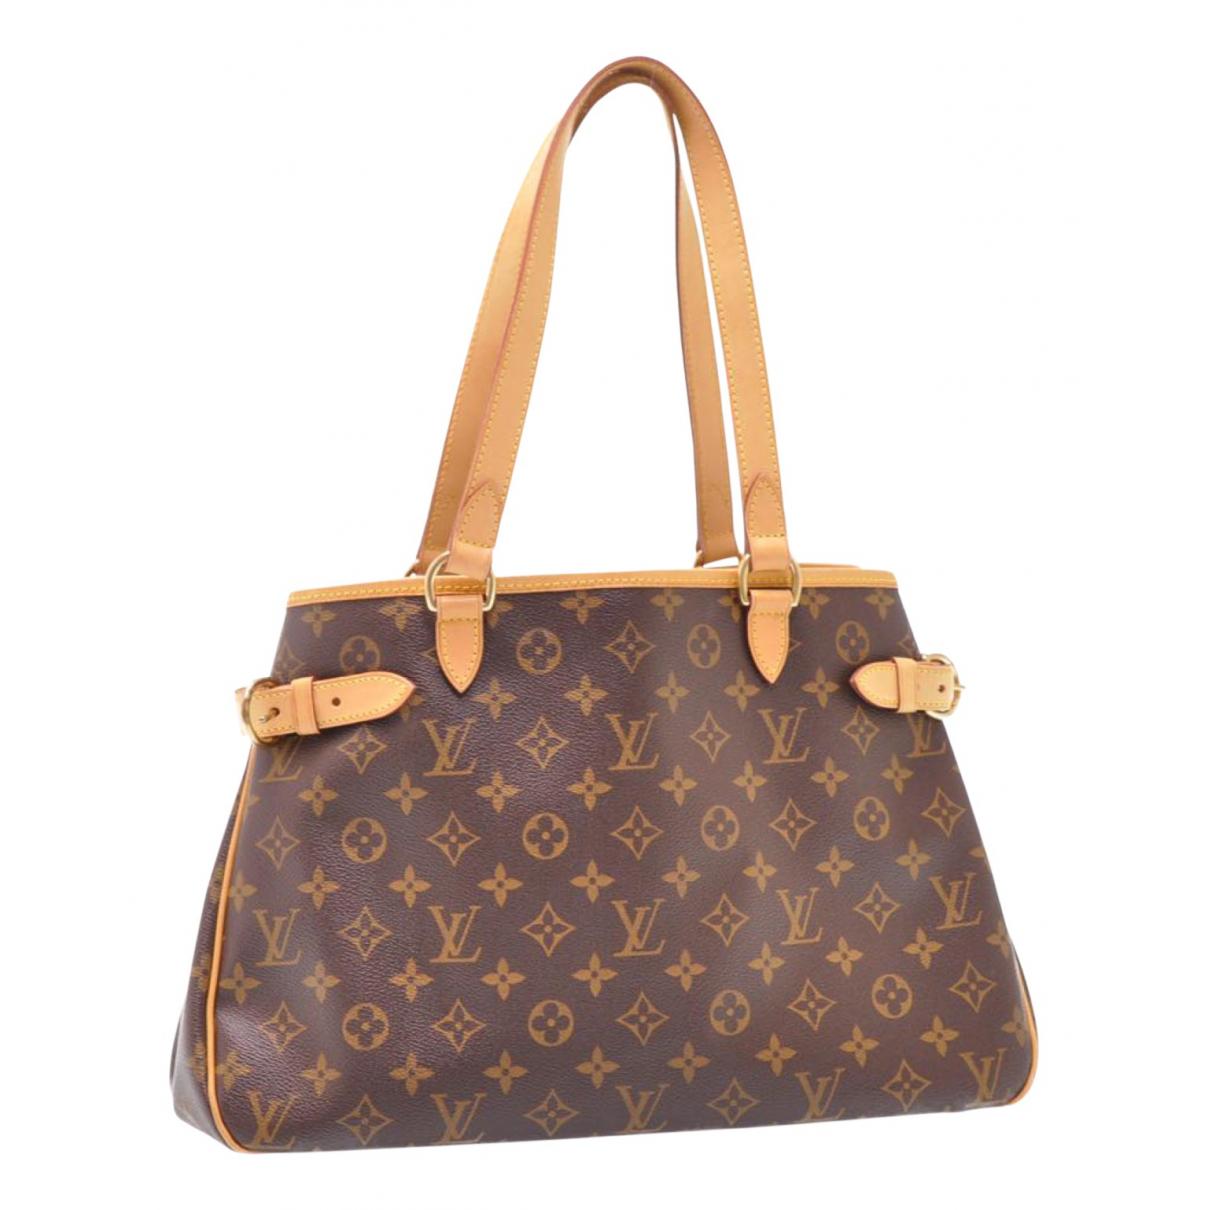 Louis Vuitton Batignolles Handtasche in  Braun Leinen